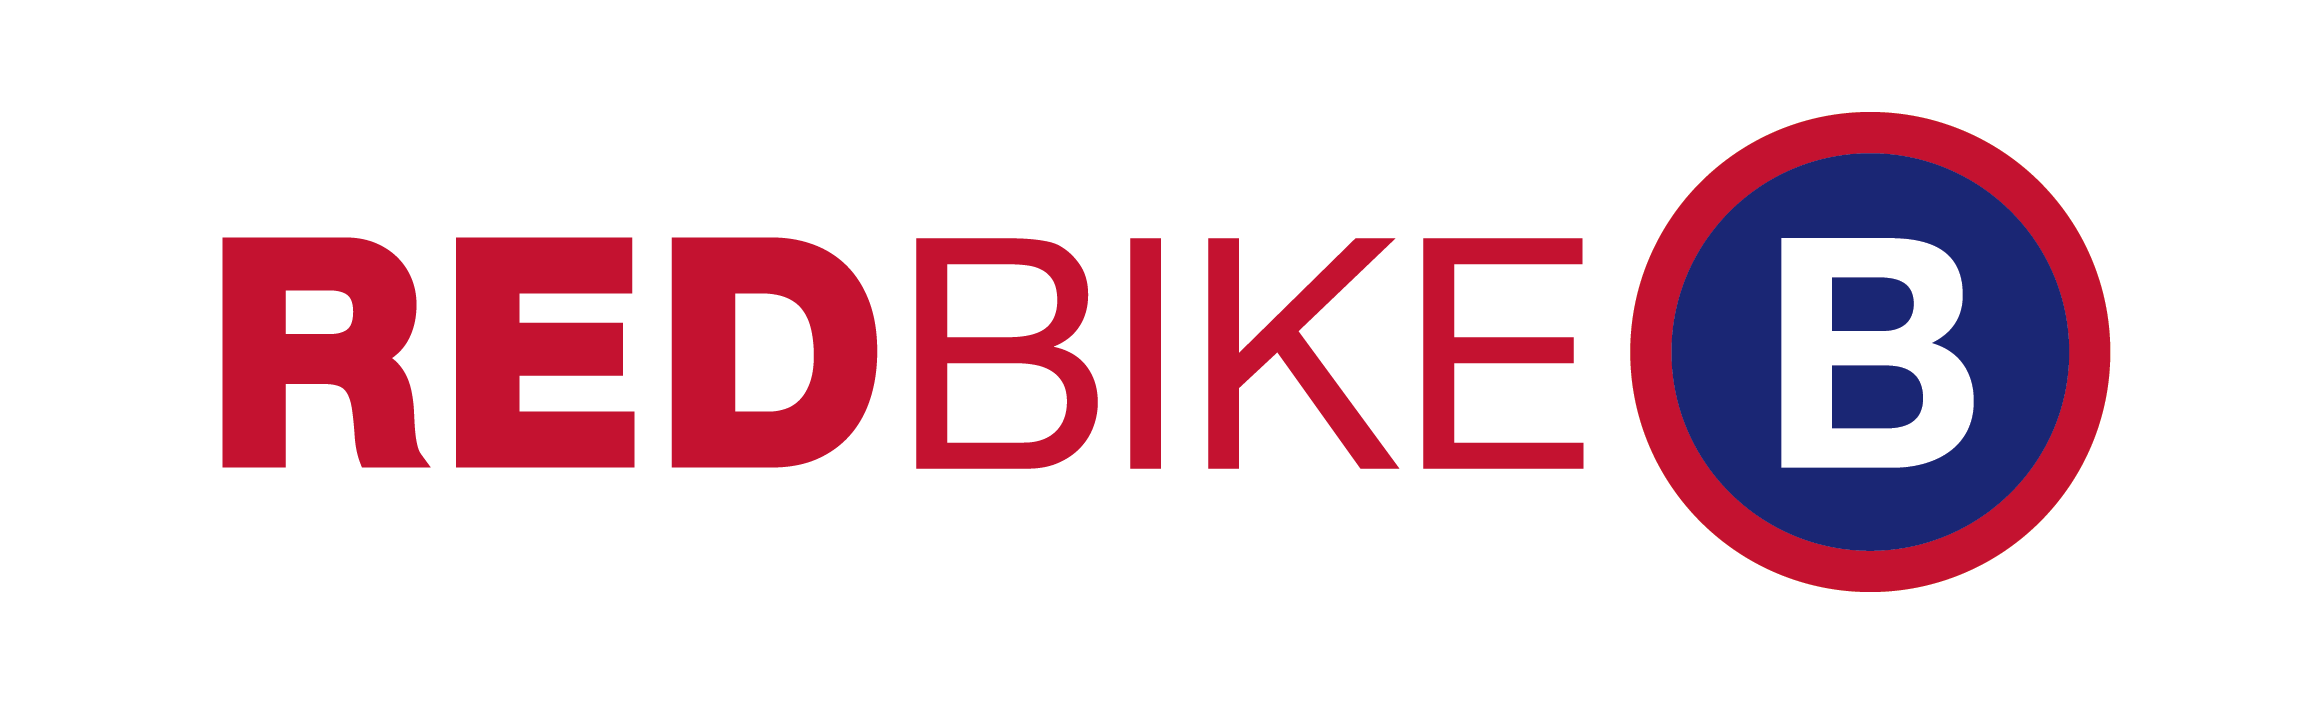 Sponsored by REDBIKE!